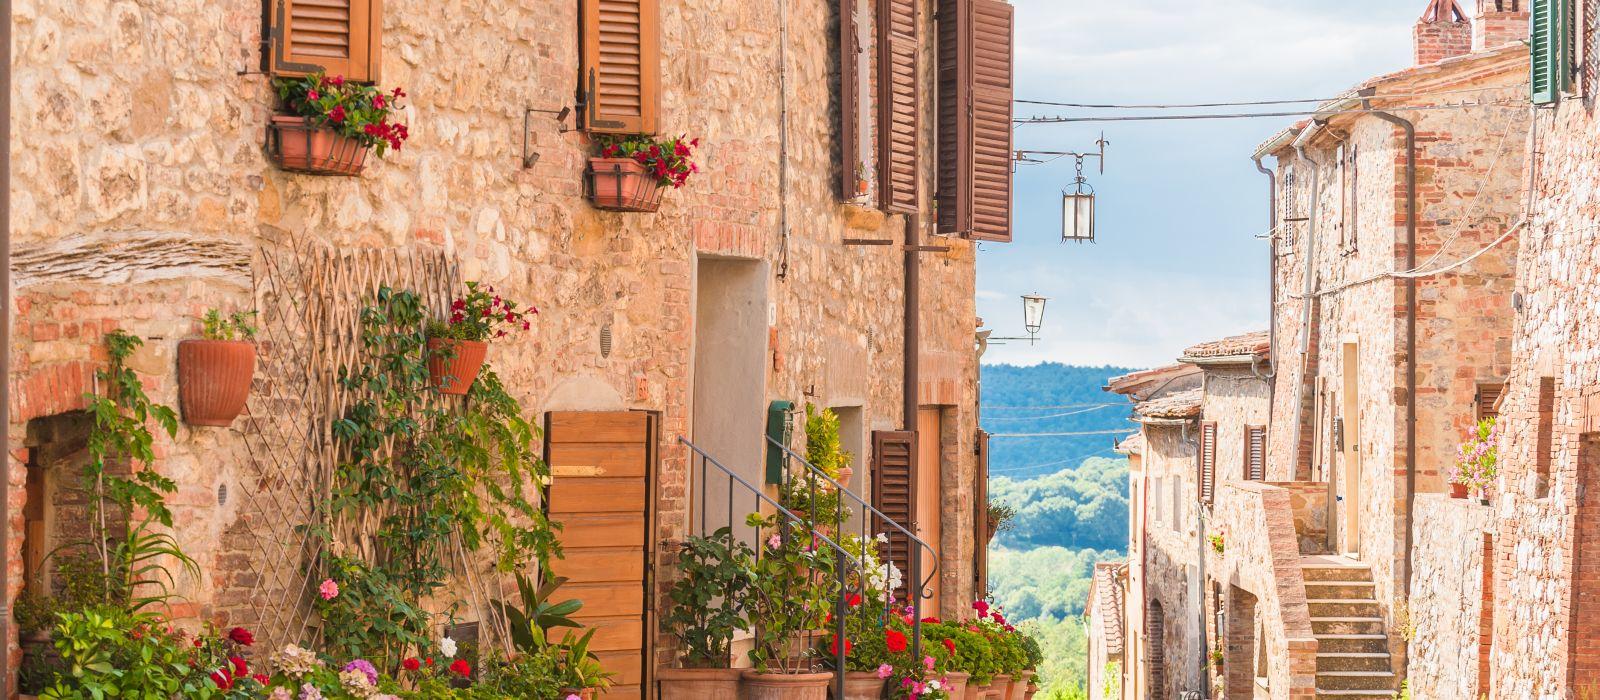 Reiseziel Siena Italien